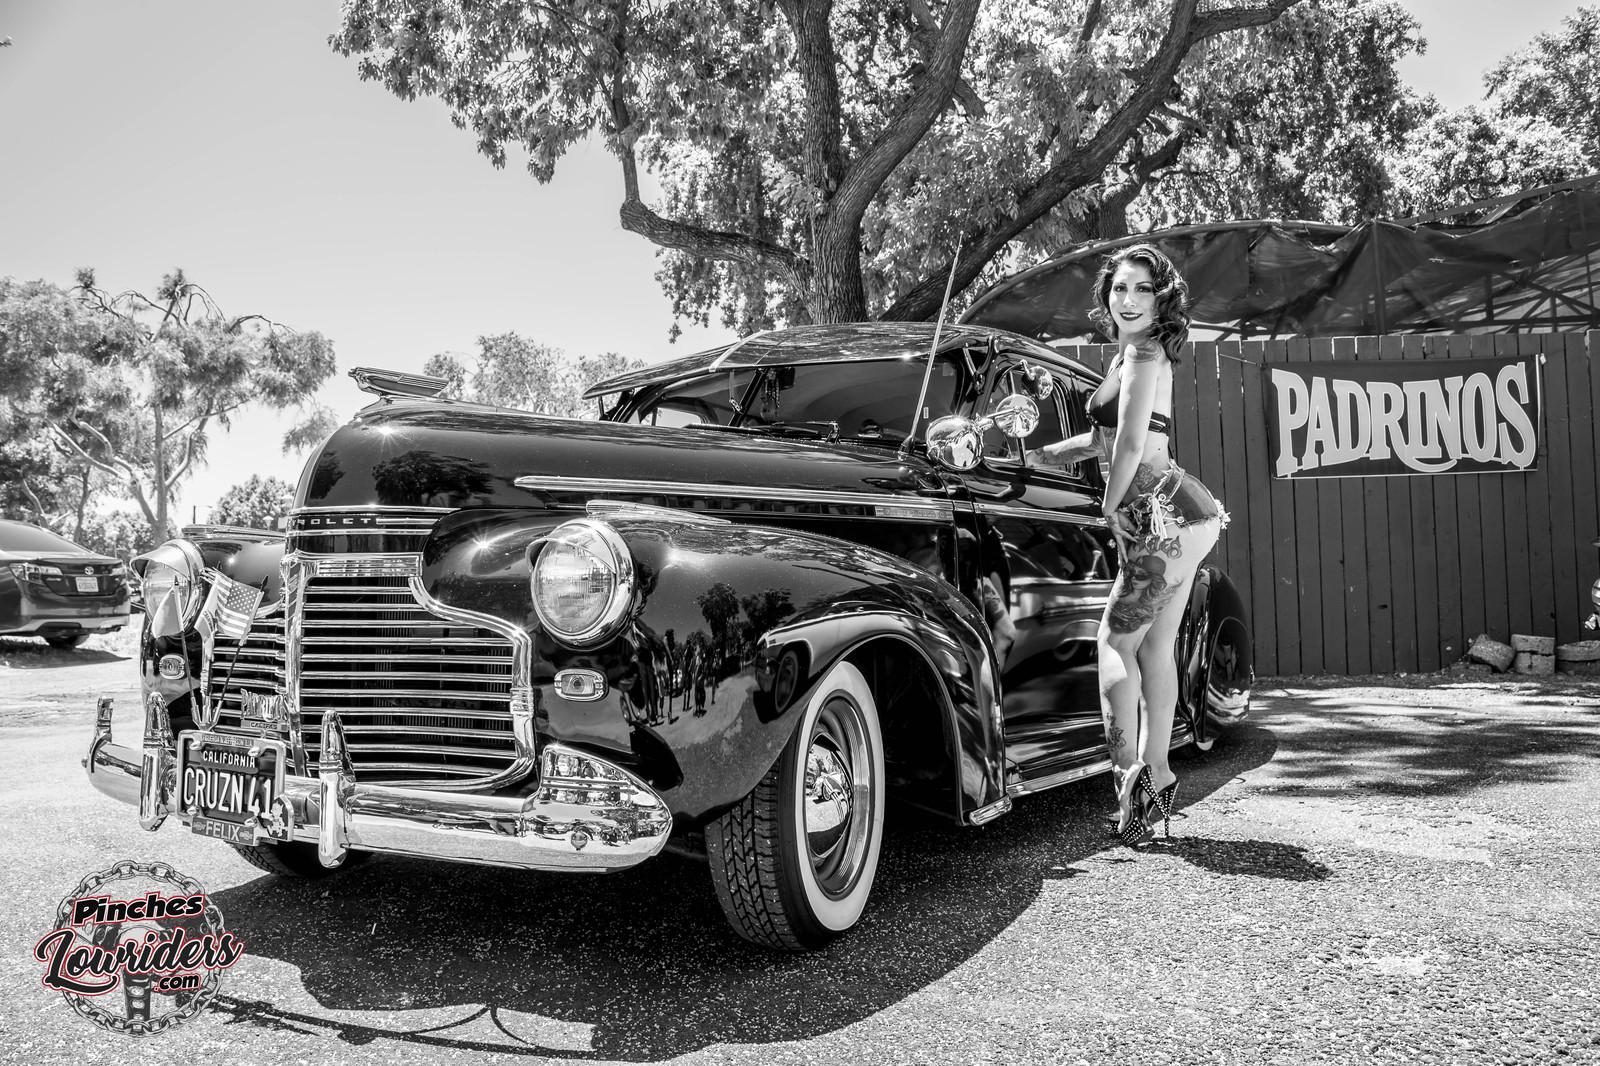 Lowrider Car Show 2018 >> pinches lowriders, lowriders, lowriding, models, lowrider, custom cars | Streetlow San Jose car ...